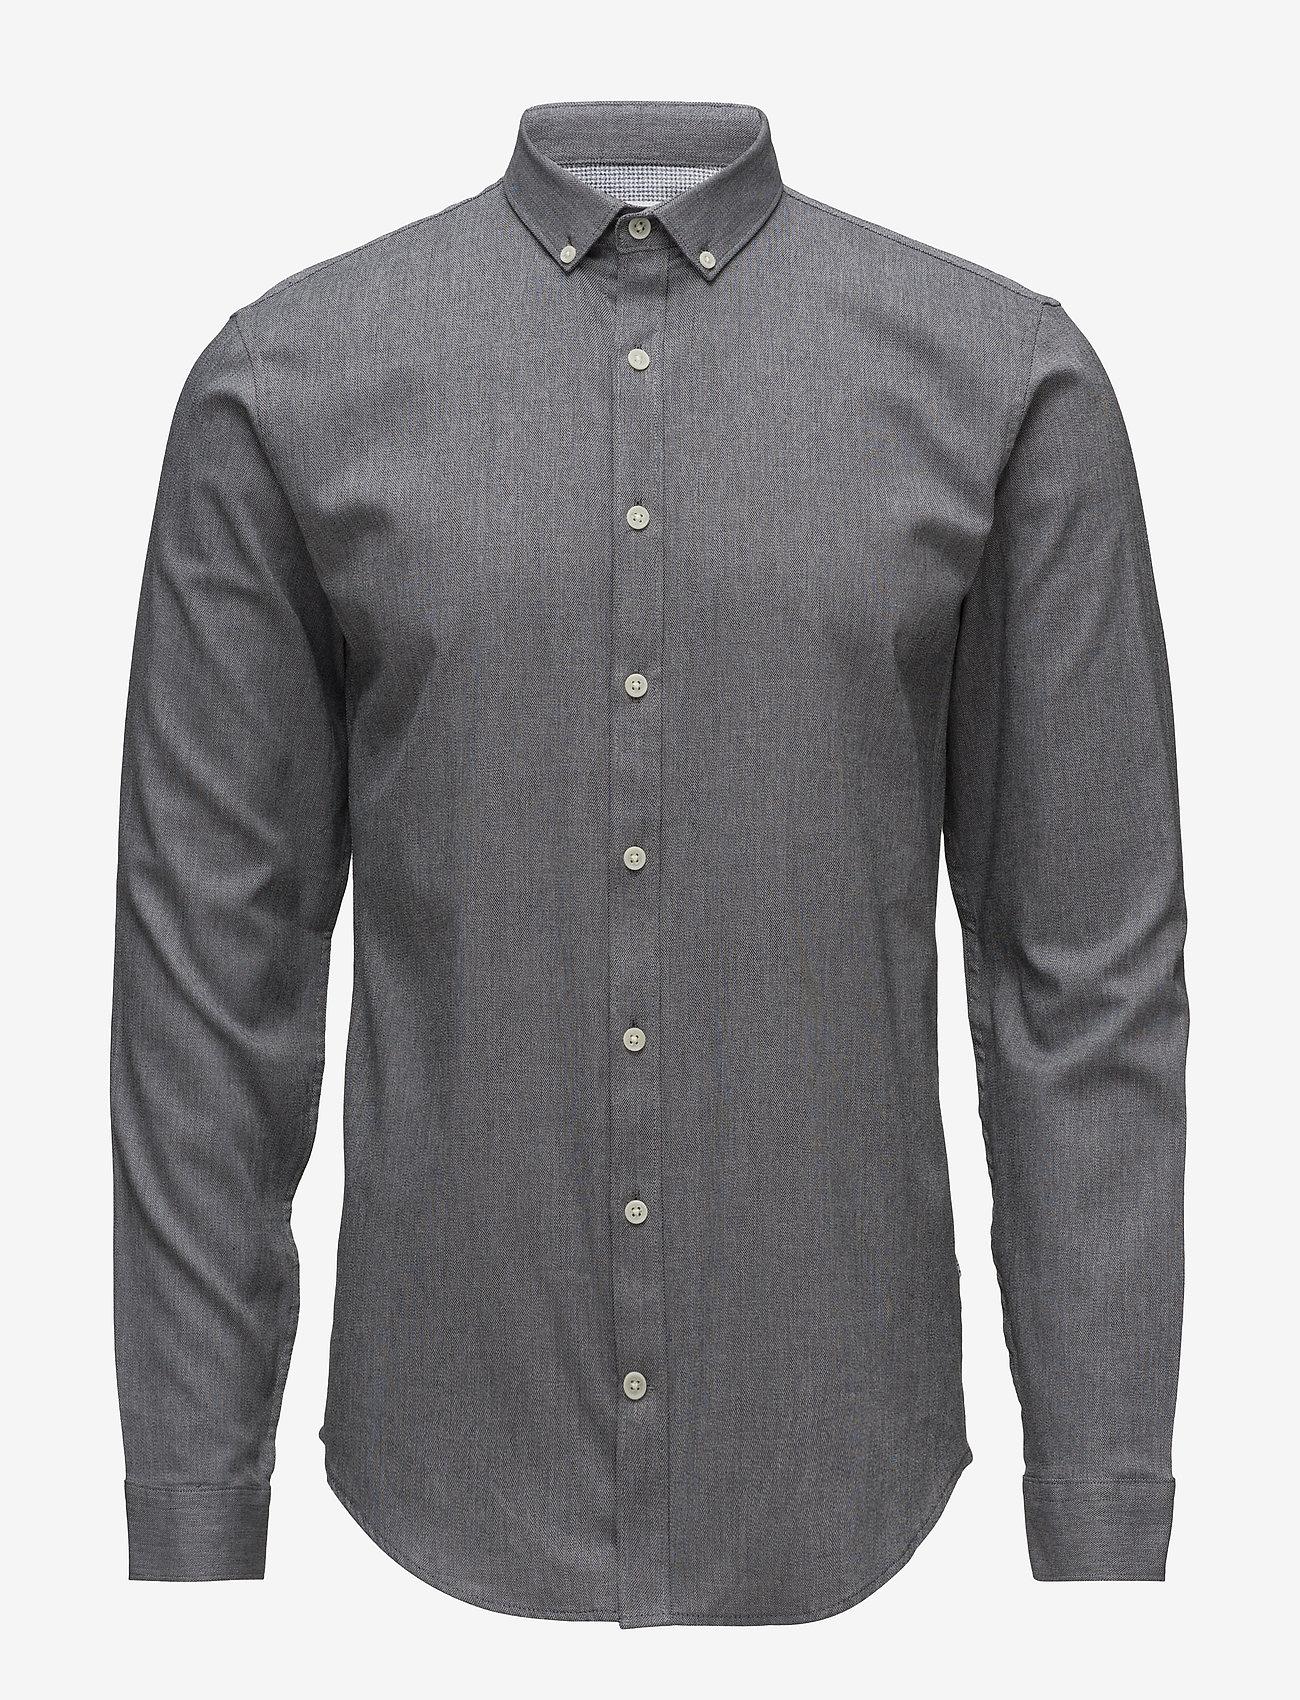 Lindbergh - Mouliné stretch shirt L/S - peruspaitoja - black - 1